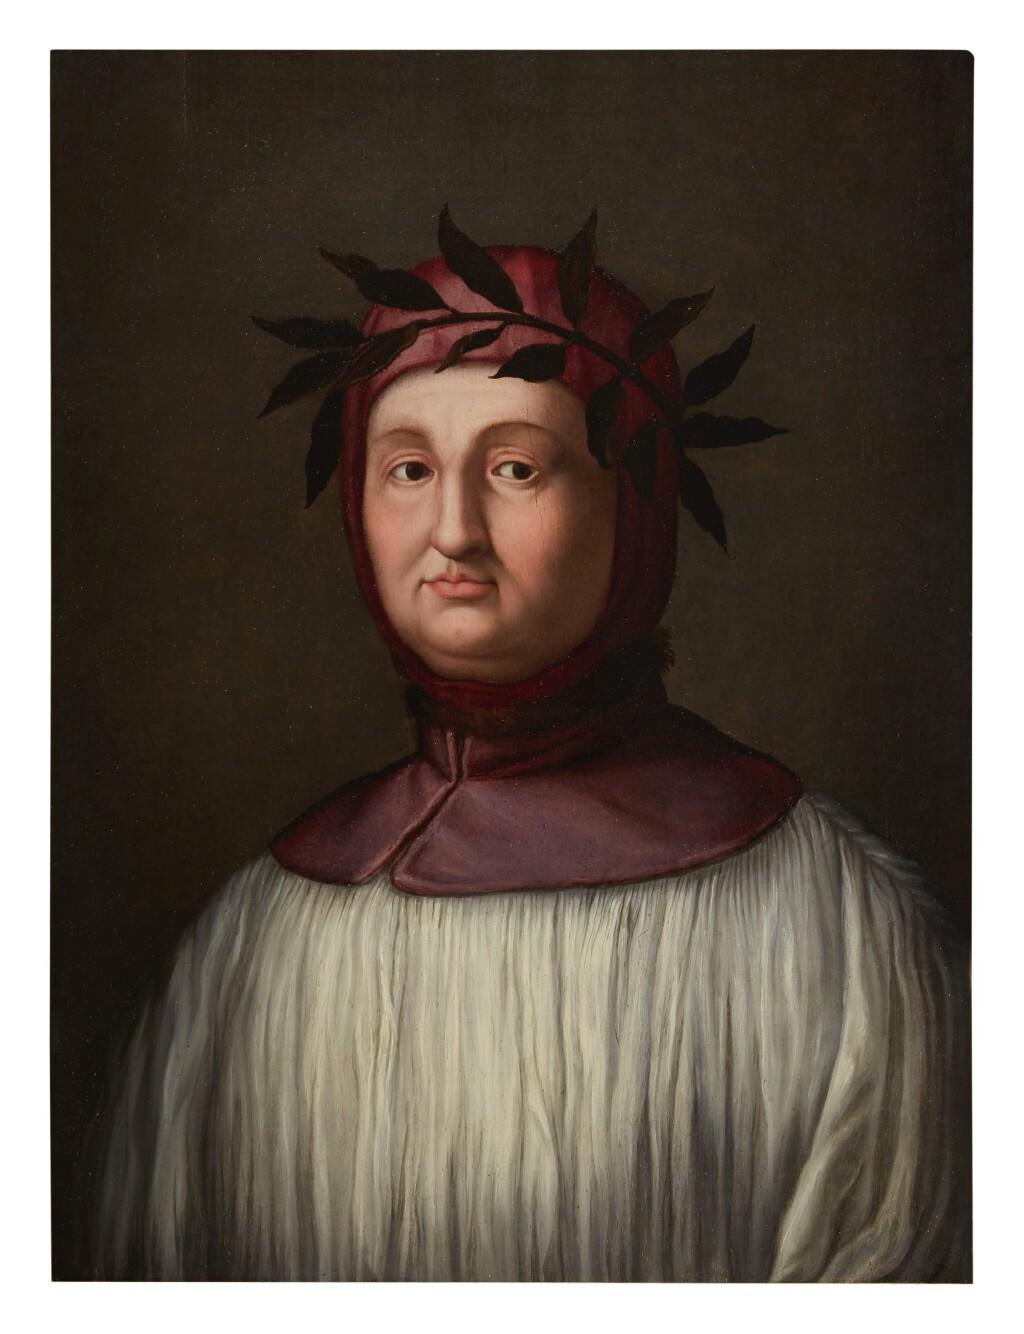 FLORENTINE SCHOOL, 16TH CENTURY   PORTRAIT OF PETRARCH